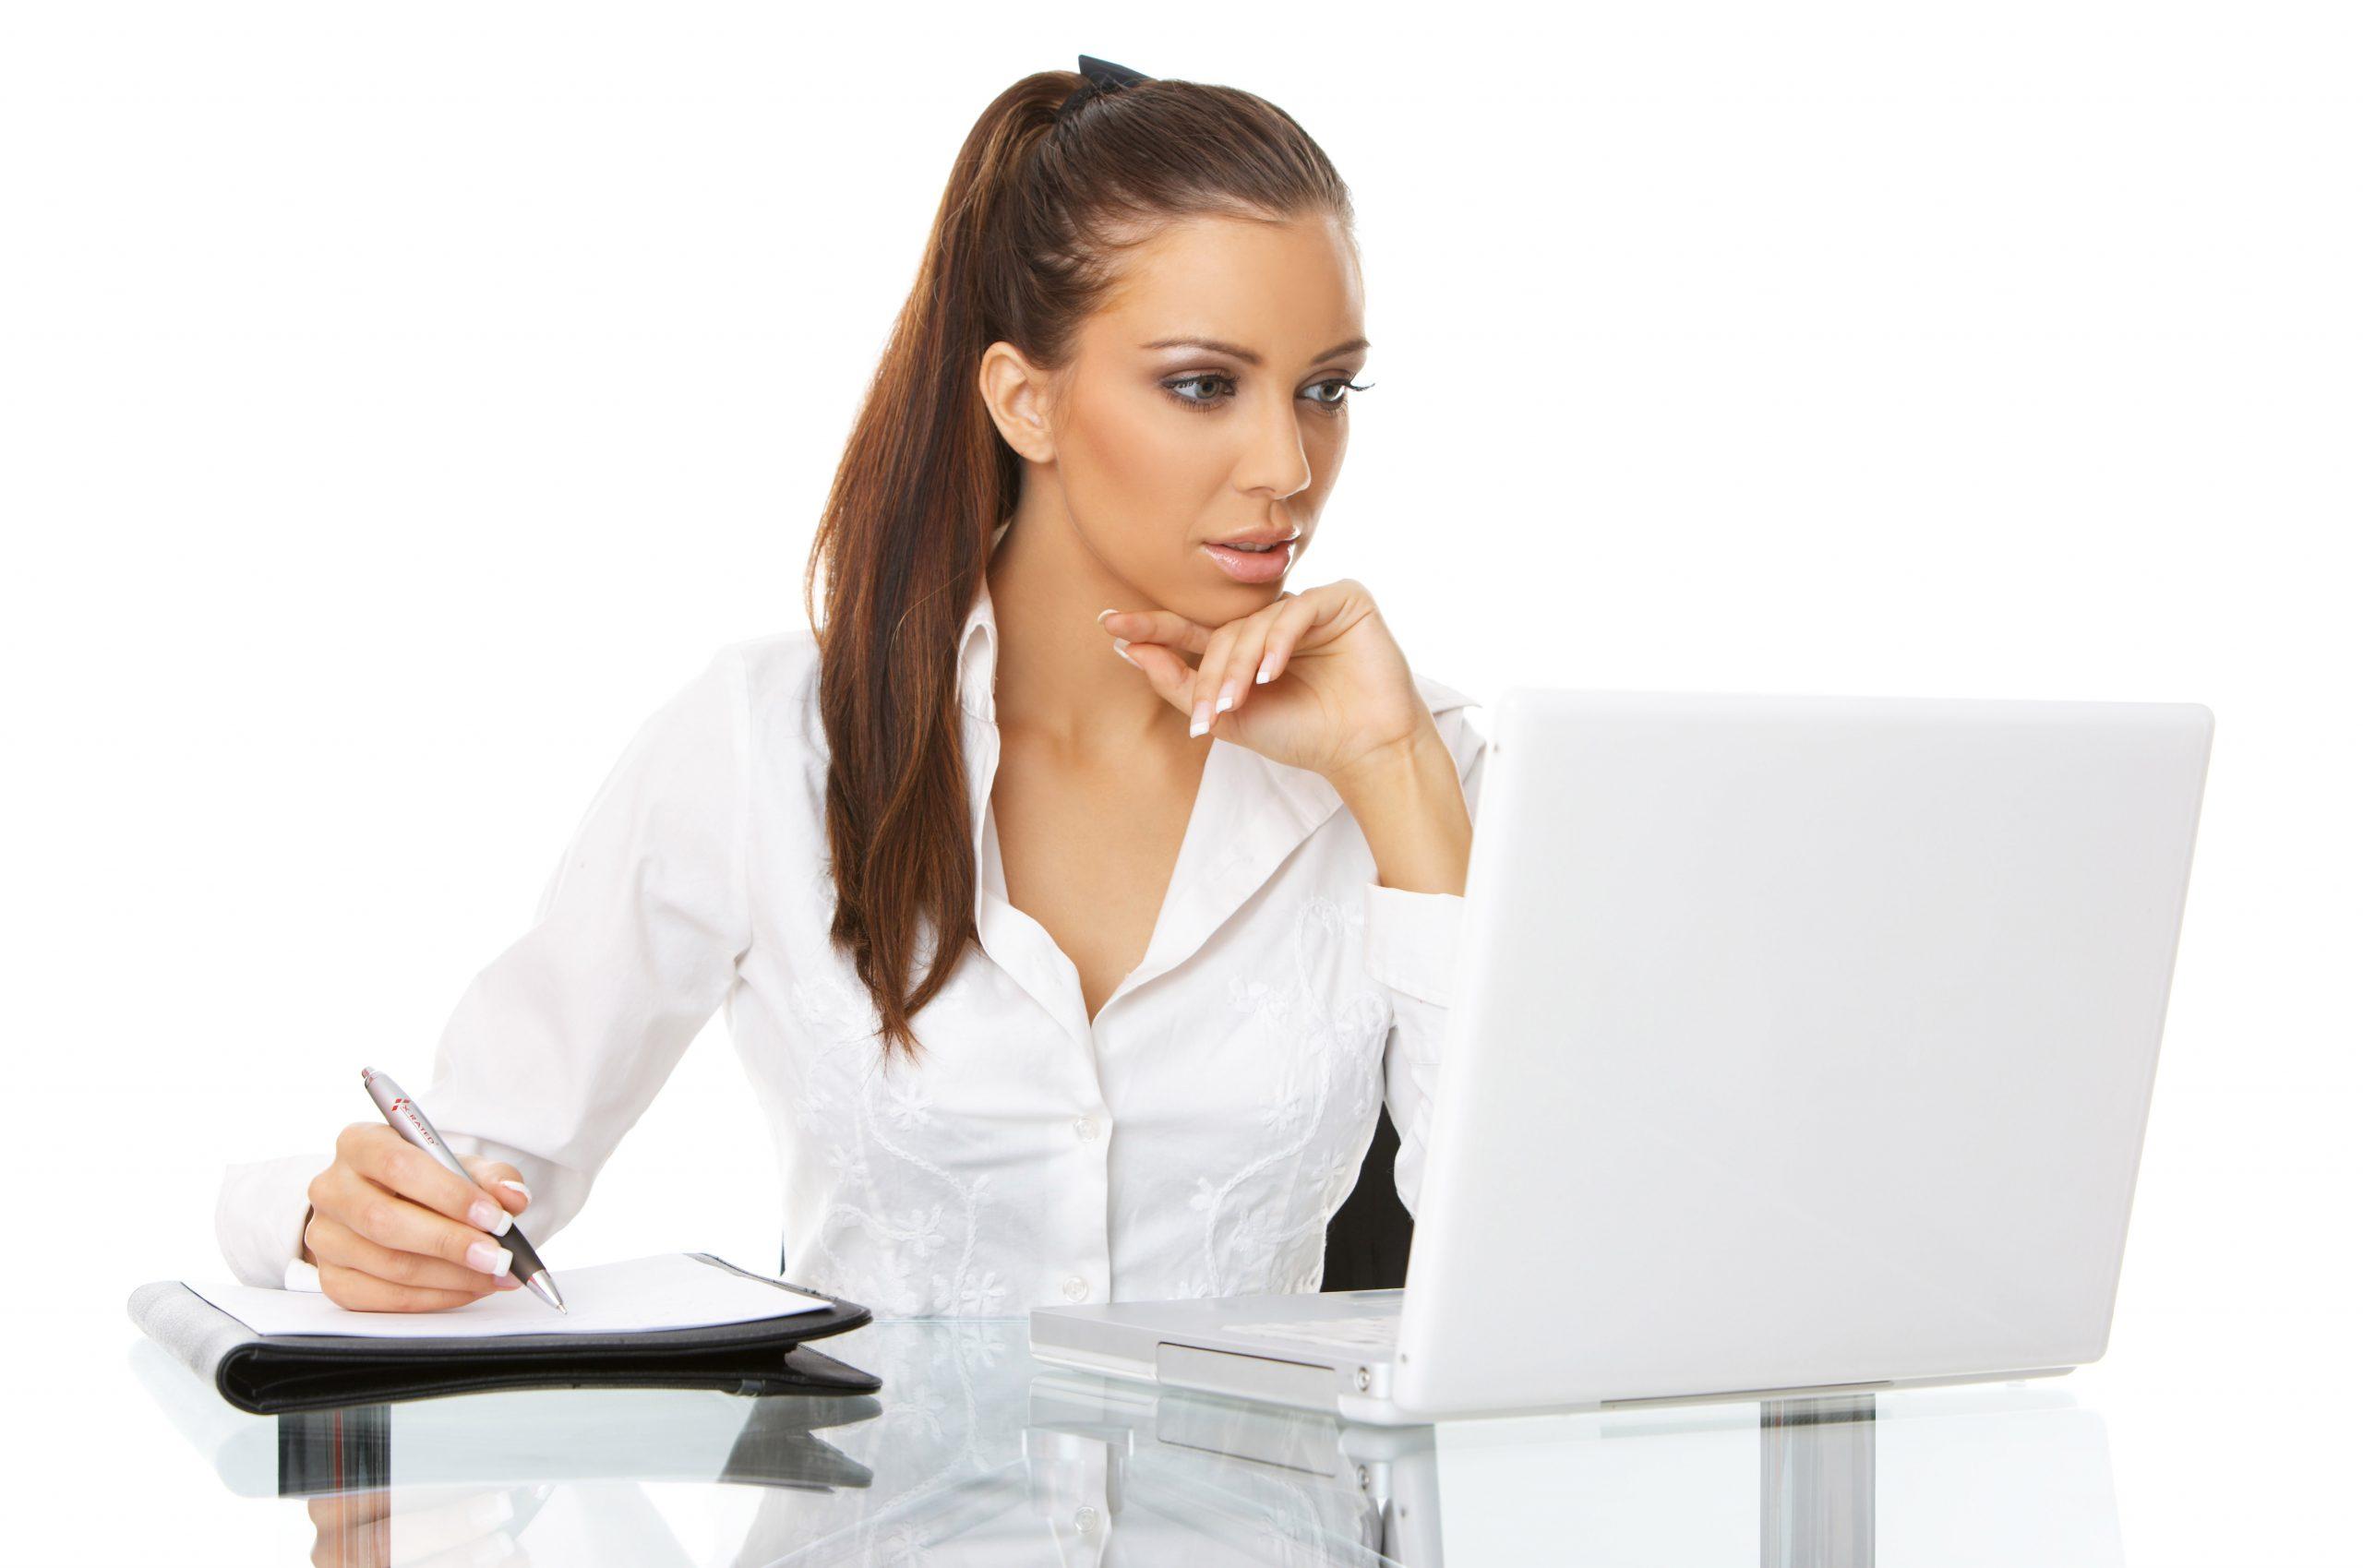 Debt Counsellors - The Basics